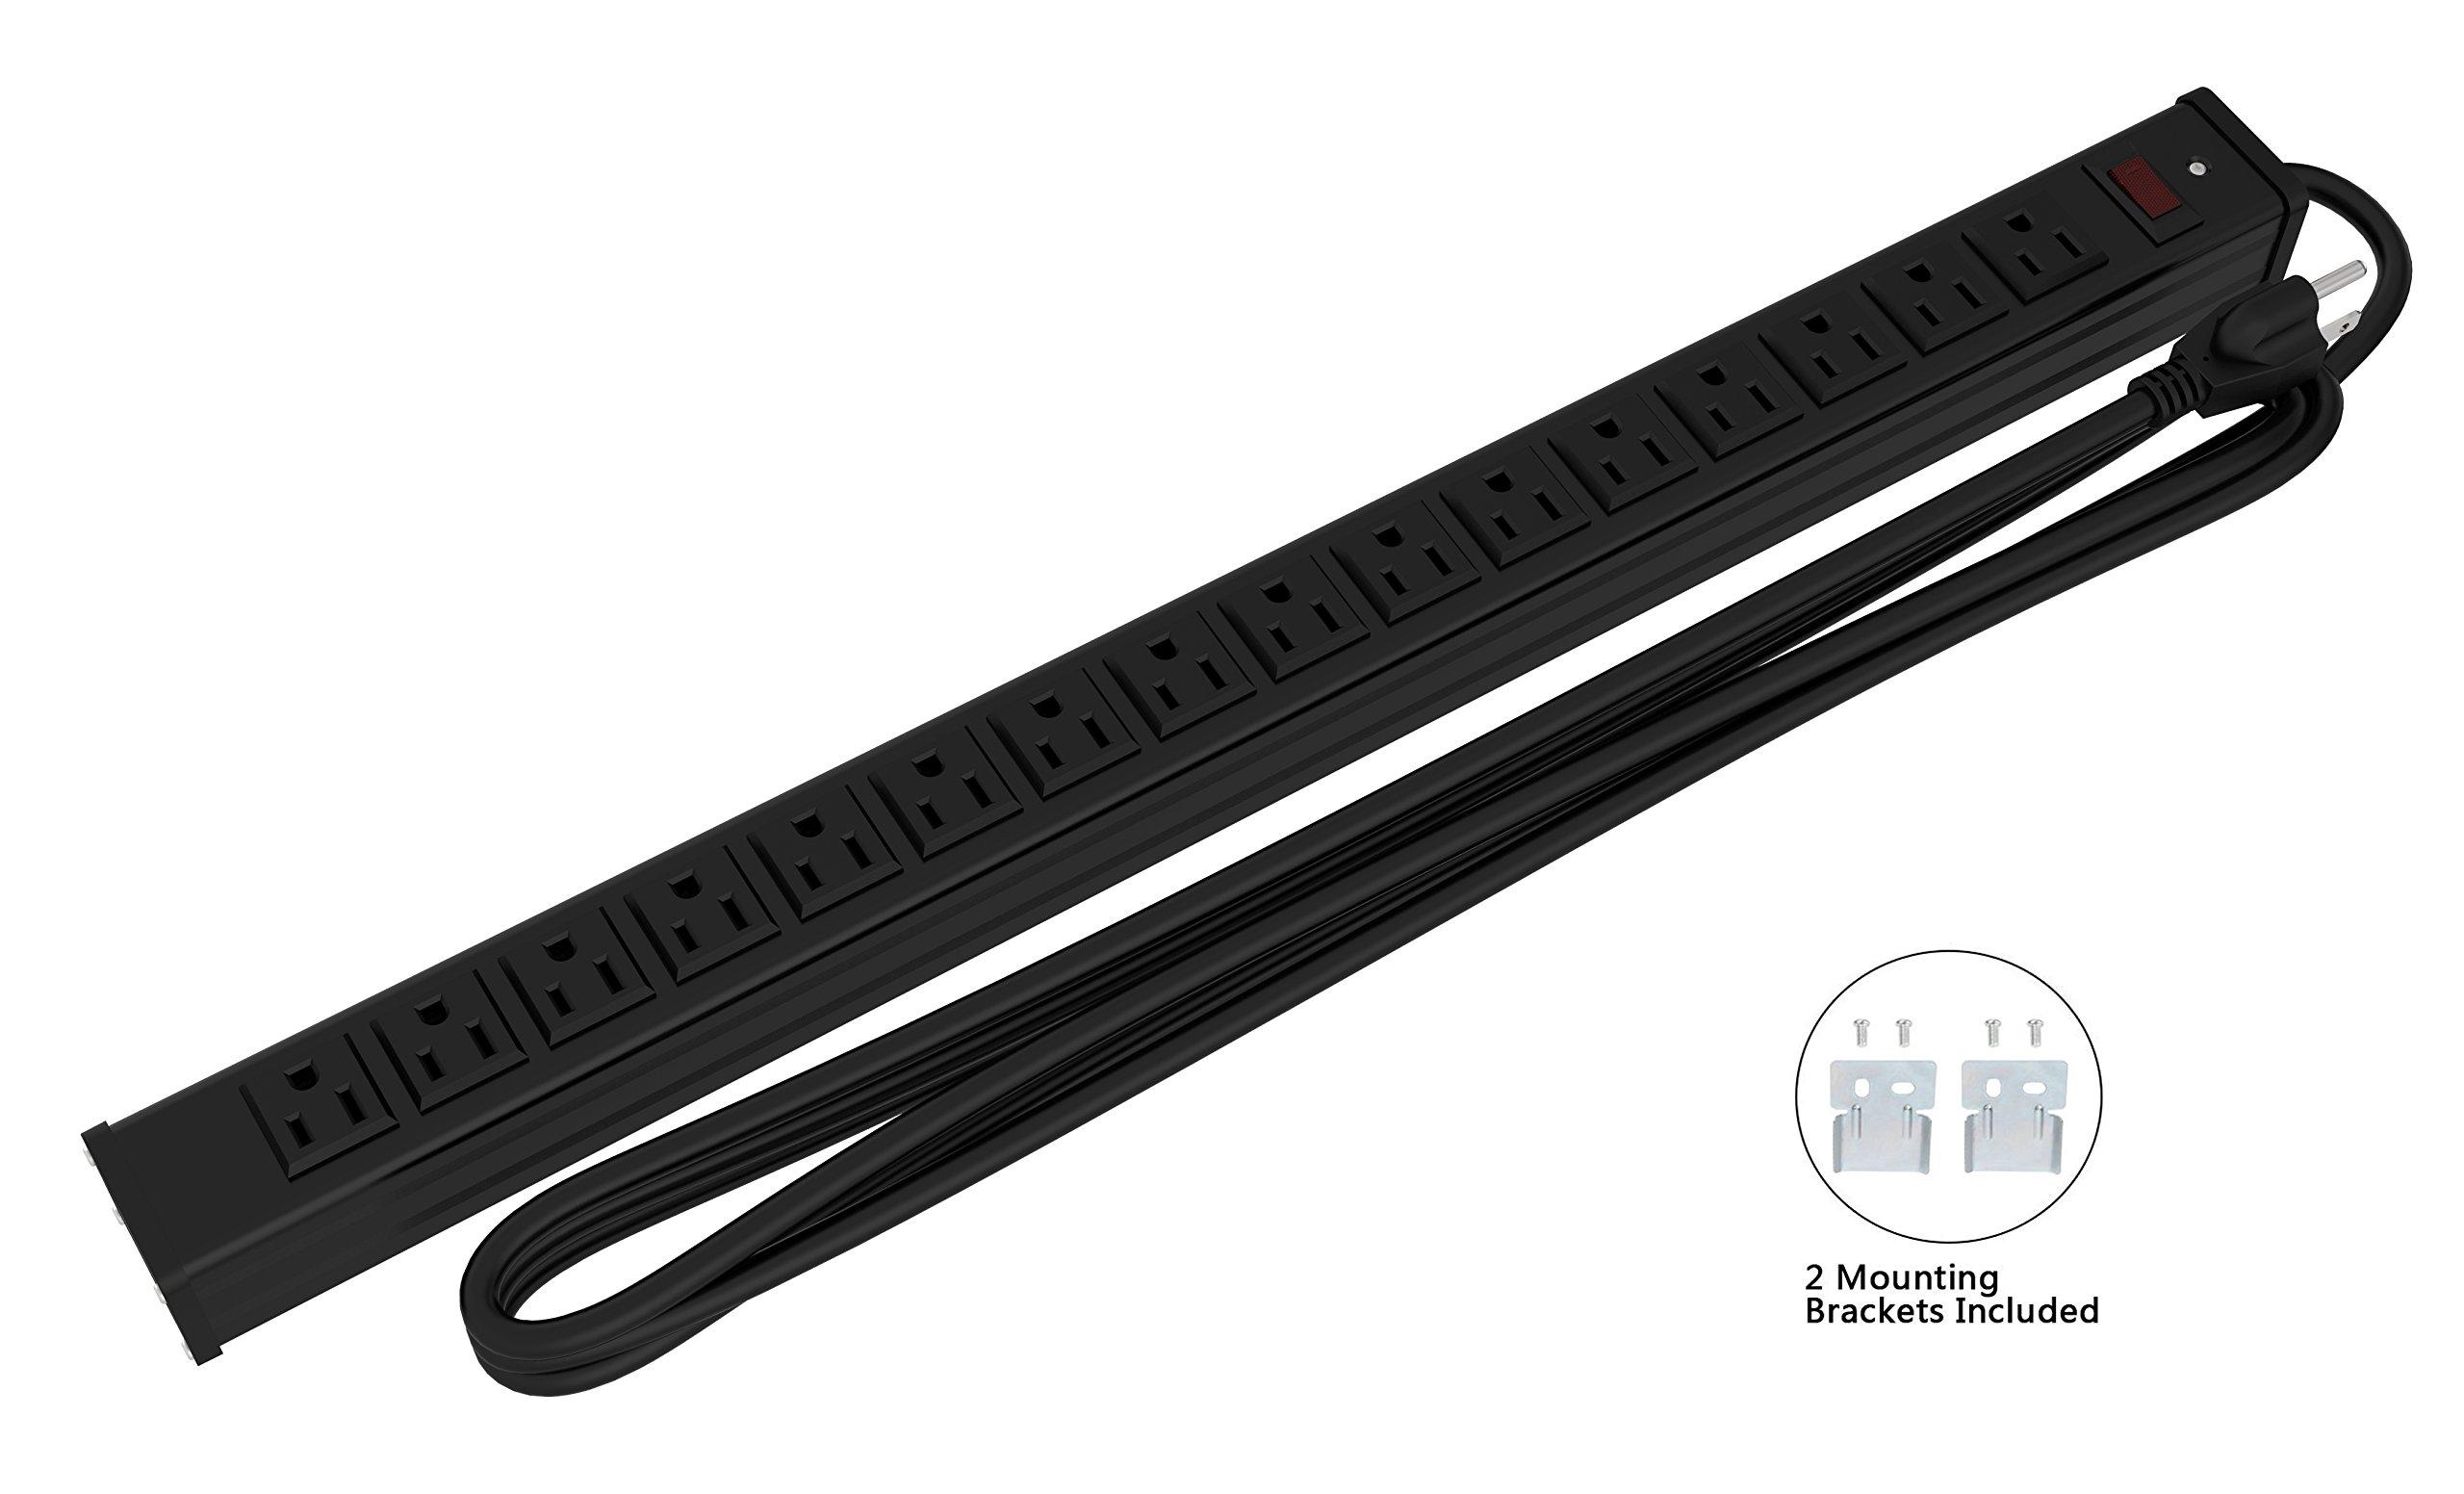 Oviitech 16 Outlets Heavy Duty Metal Socket Power Strip, 15-Foot Long Extension Cord with Circuit Breaker. Mounting Brackets Included,Workshop/Industrial use,ETL Certified